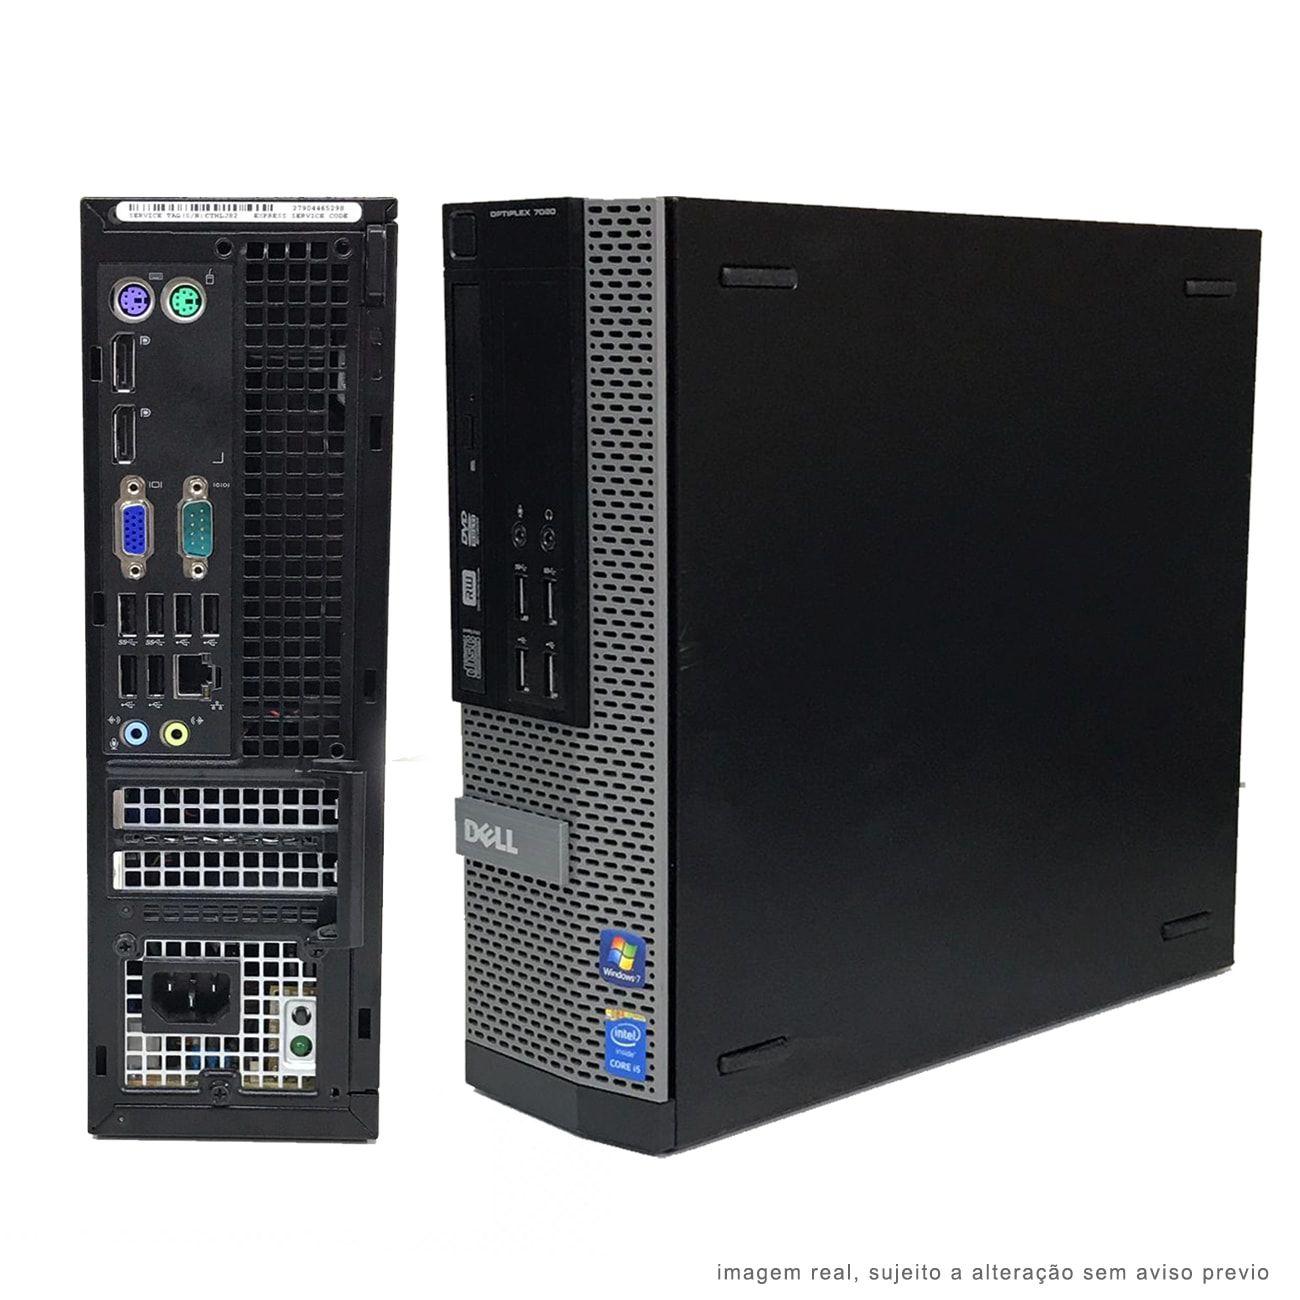 Computador Dell i5 3470 8GB HD 500GB Wifi Win10 Promoção